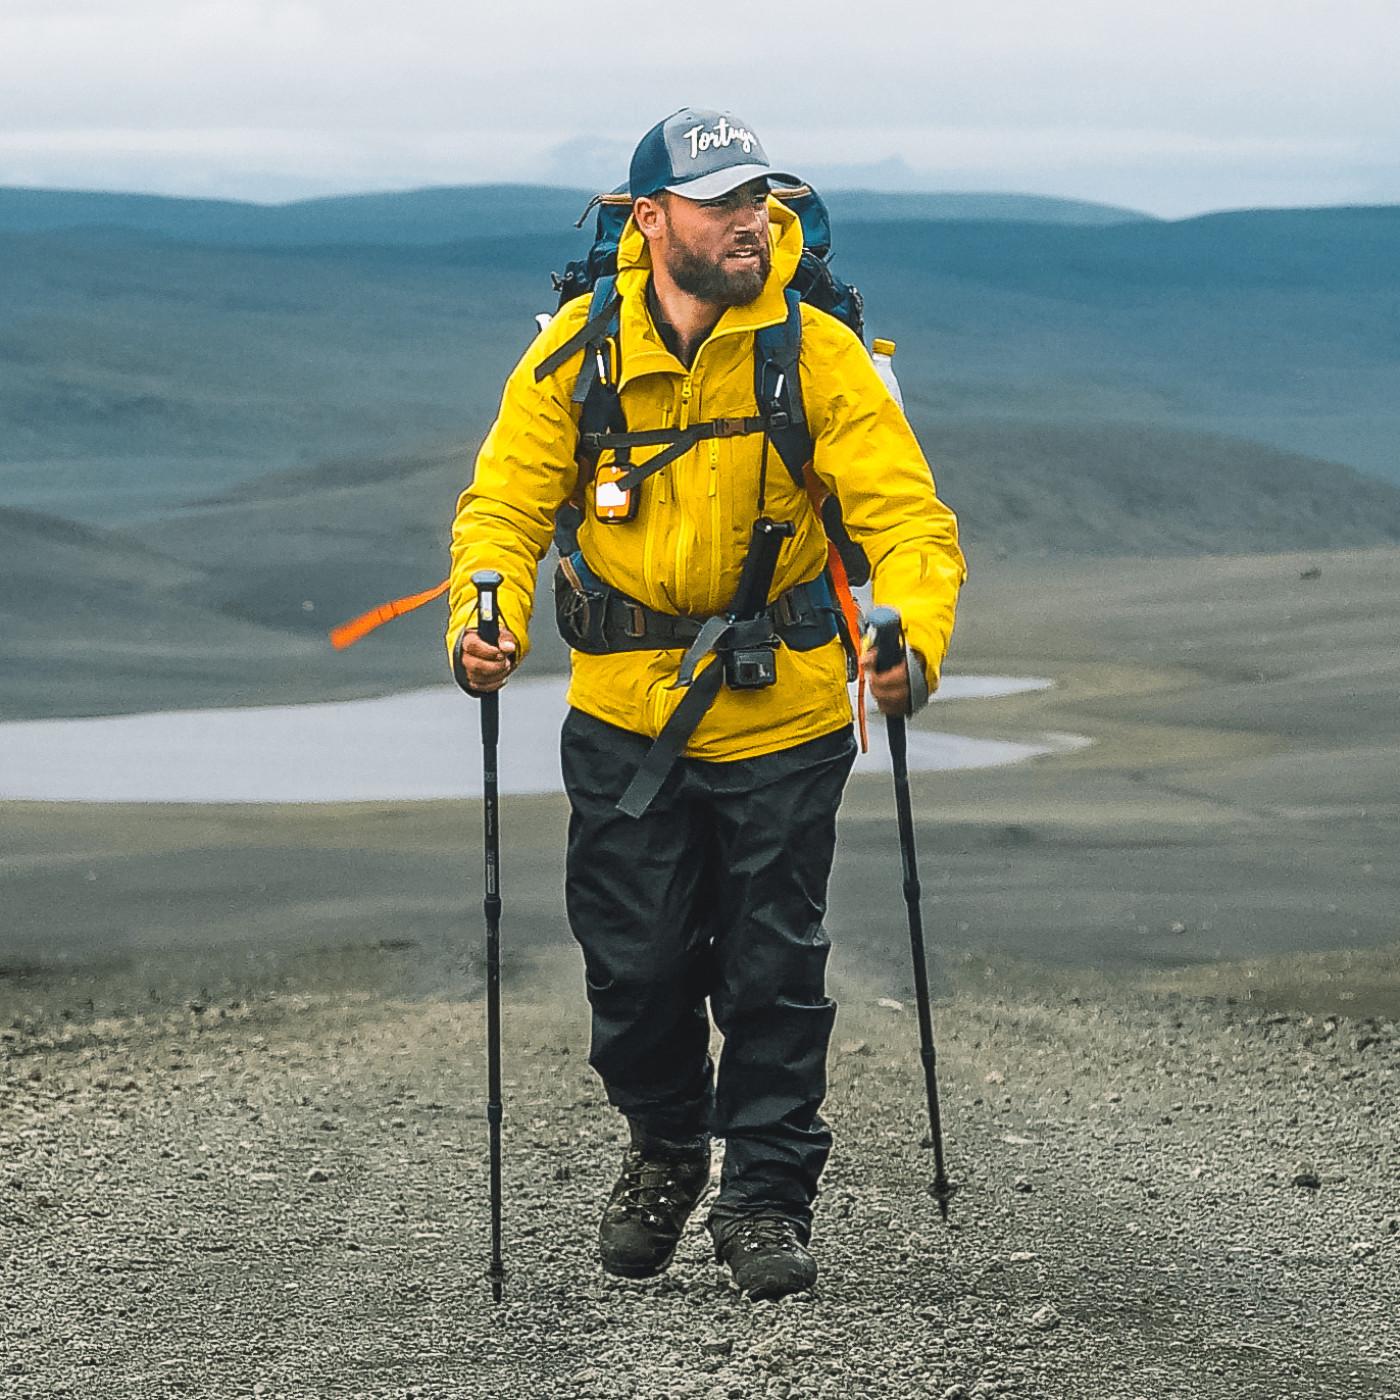 0403 - Globe Trotter - Tortuga : Seul en Islande